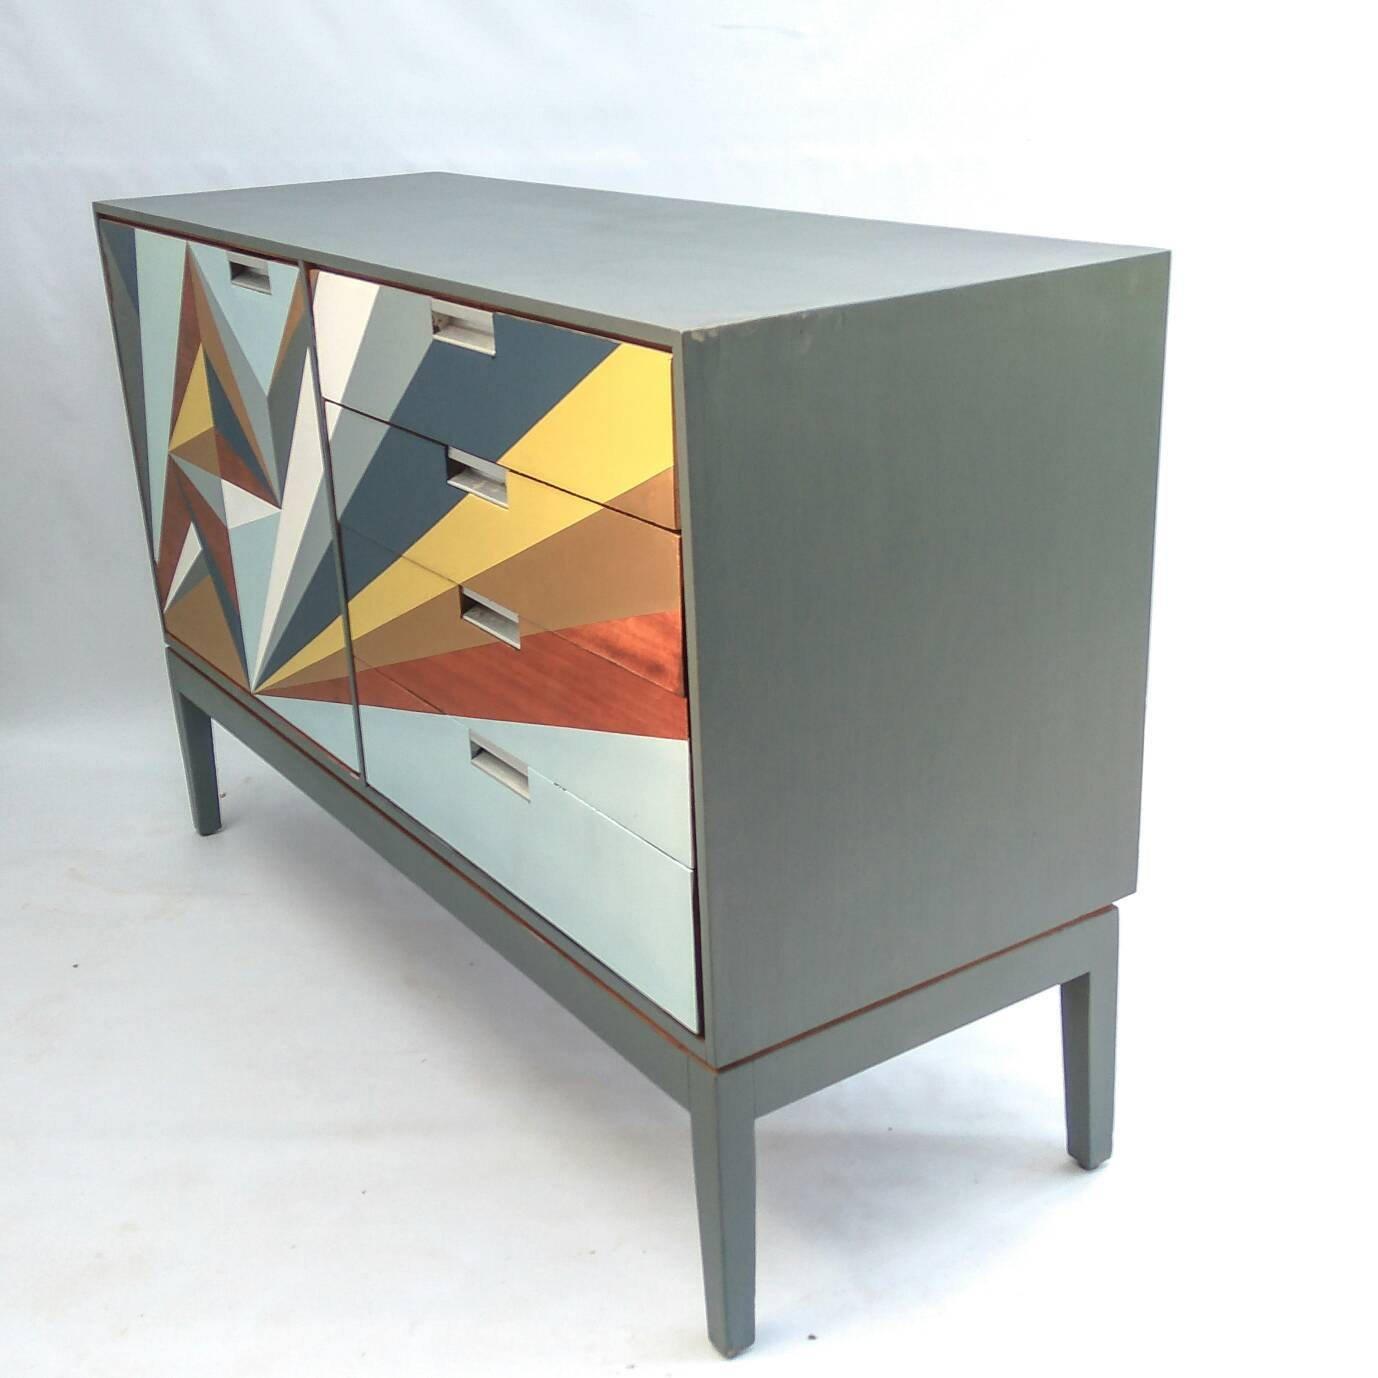 Retro Sideboard Geometric Handpainted Mid Centuryteak Buffet Pertaining To White Geometric Buffets (Gallery 13 of 30)